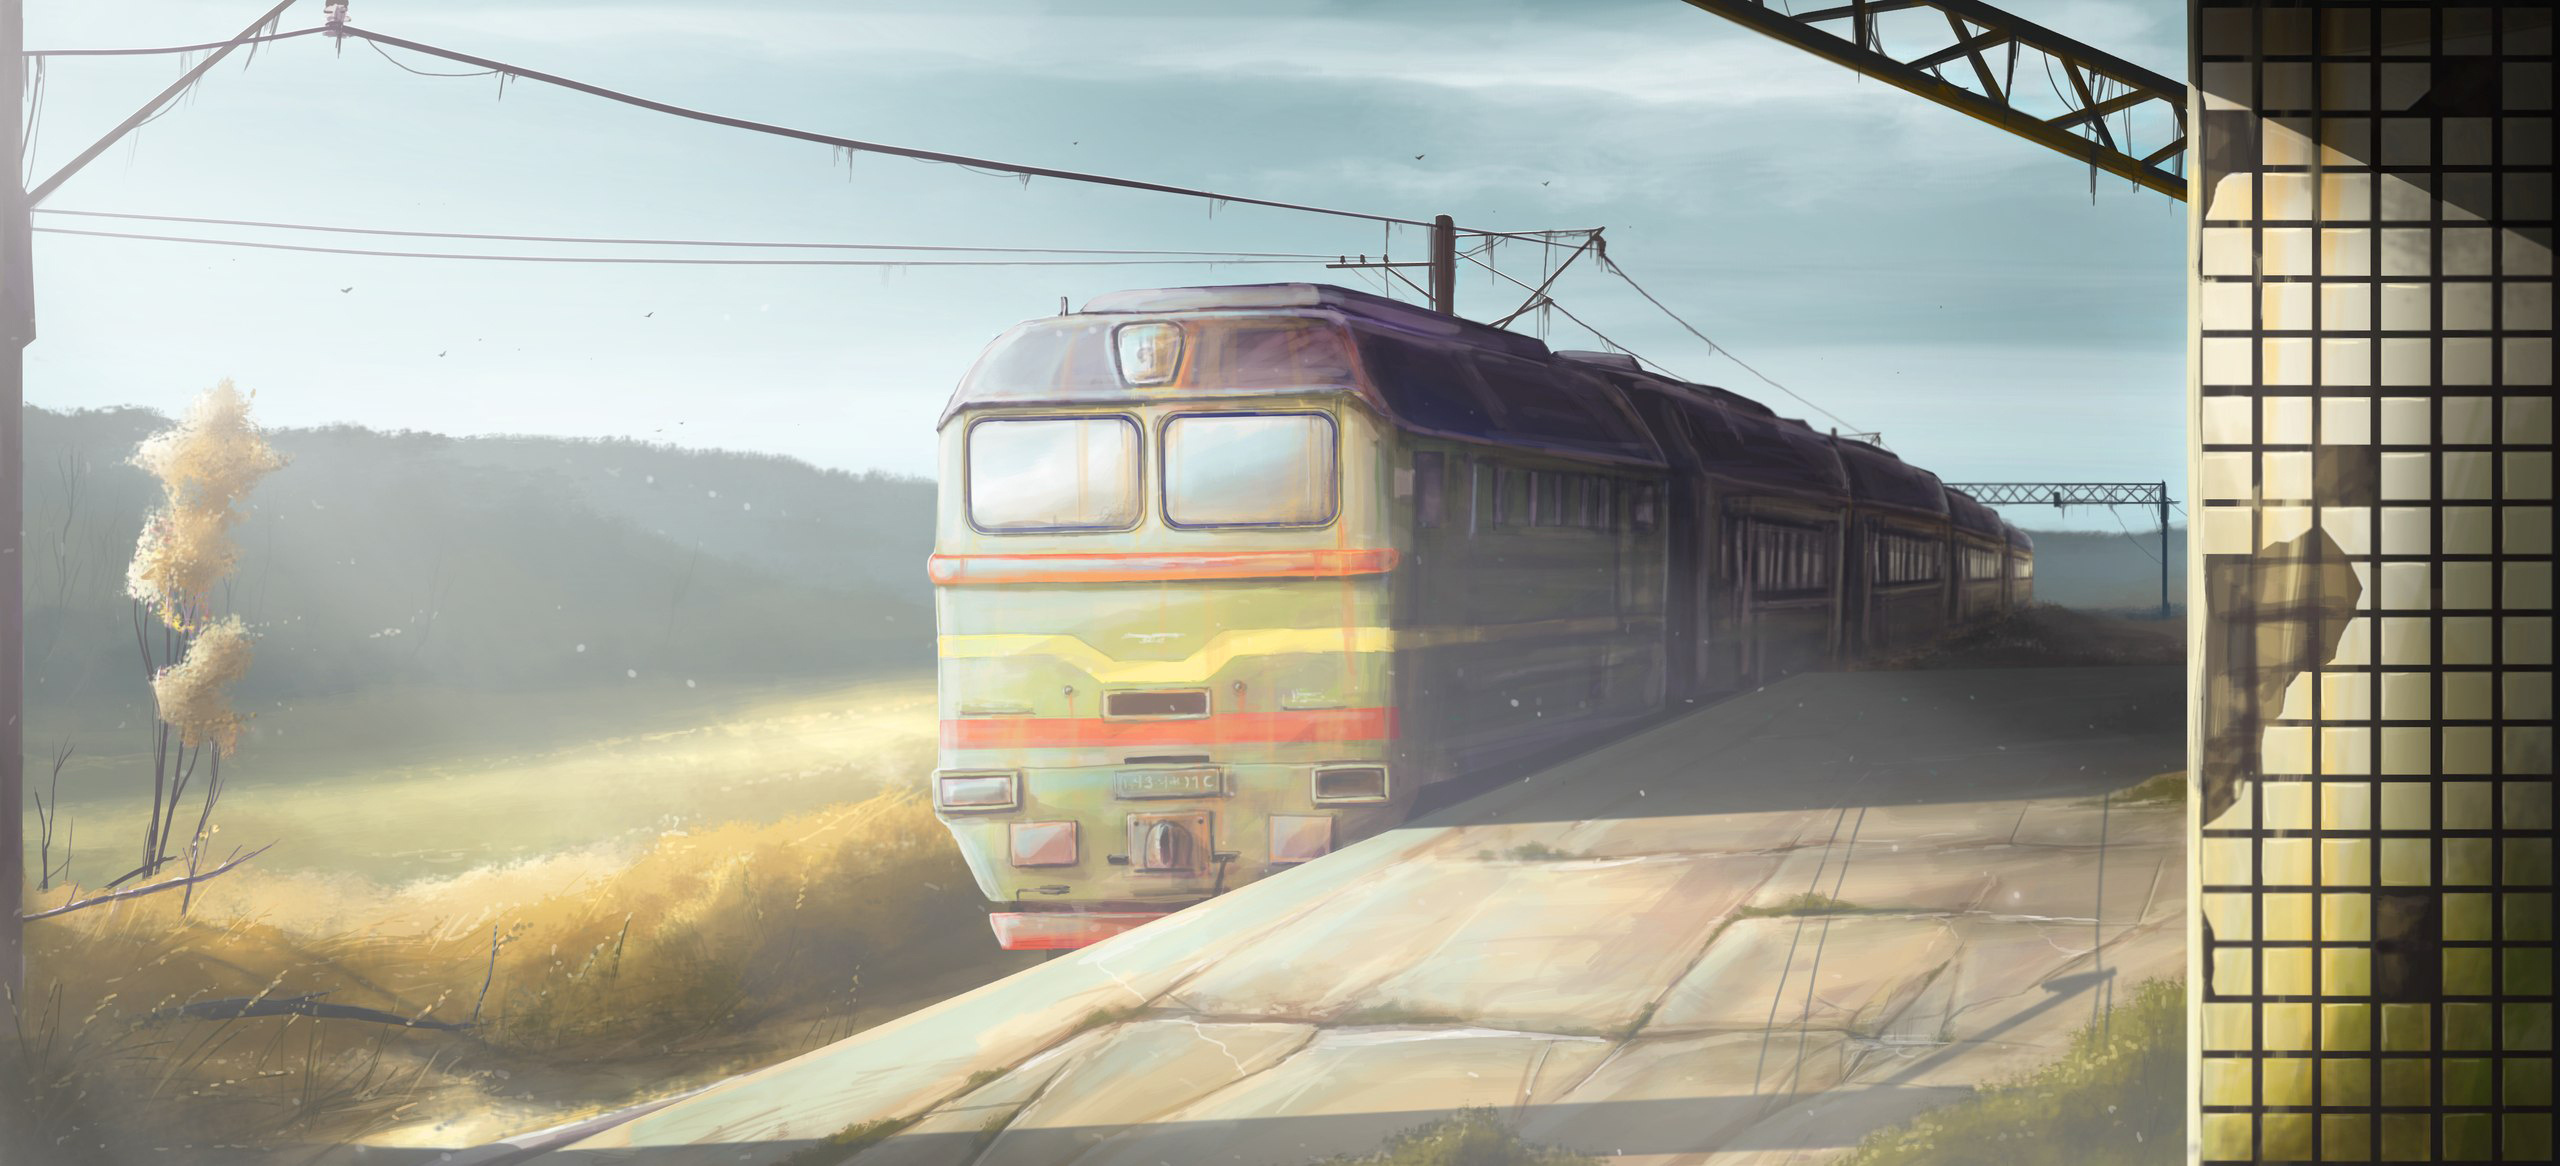 Original art station train morning trains wallpaper | 2560x1166 ...